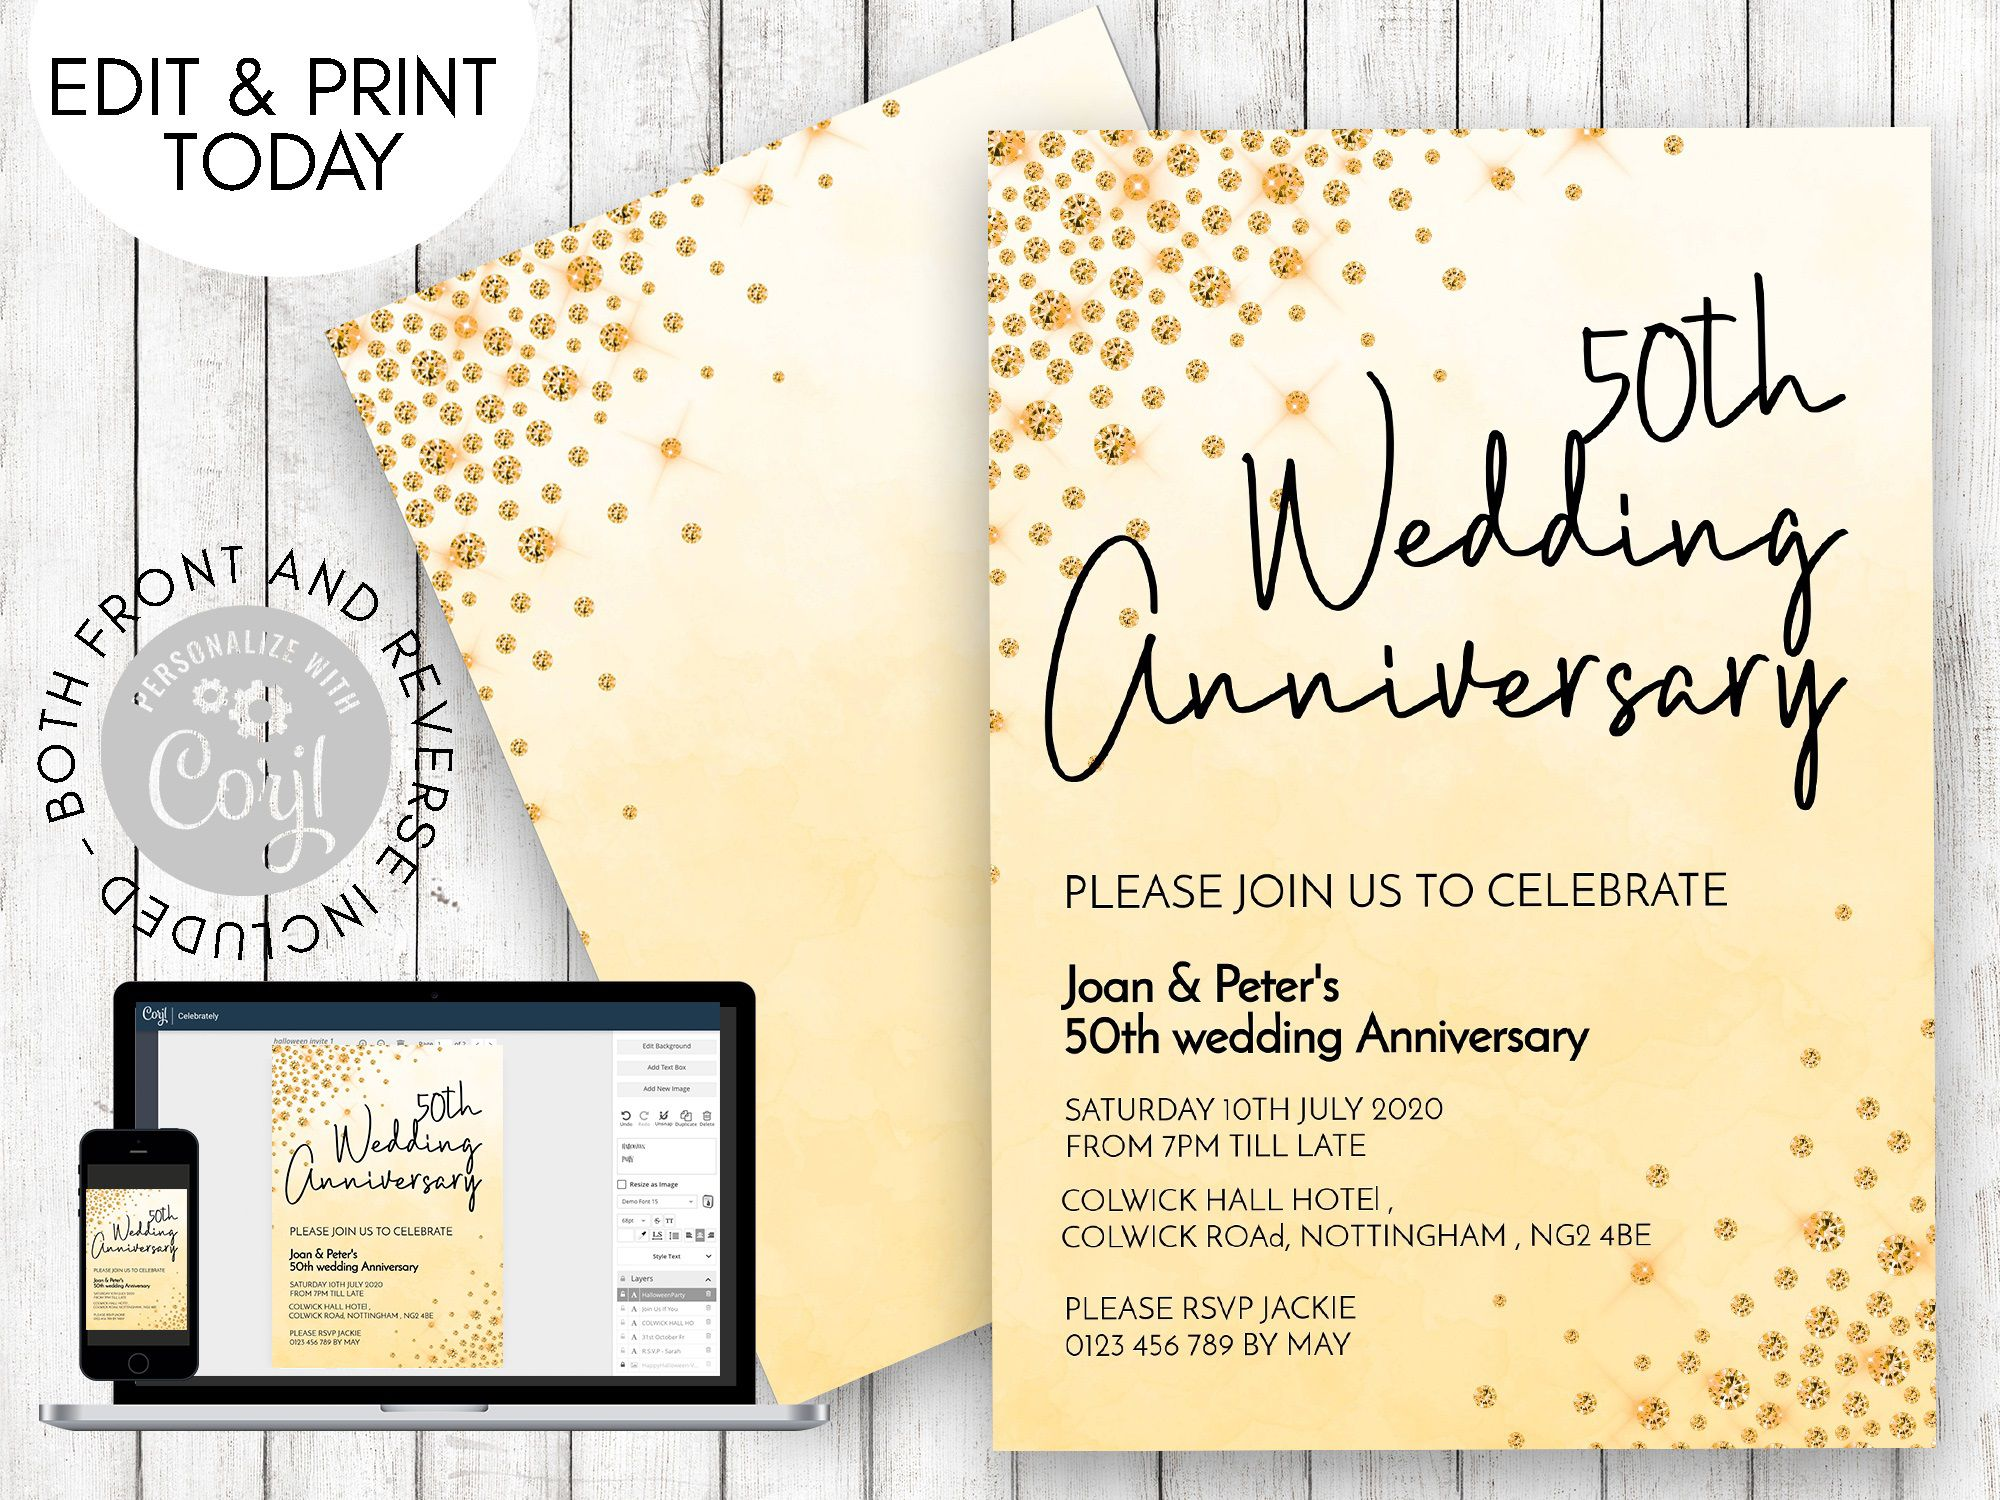 002 Beautiful 50th Anniversary Invitation Template Free High Resolution  Download Golden WeddingFull